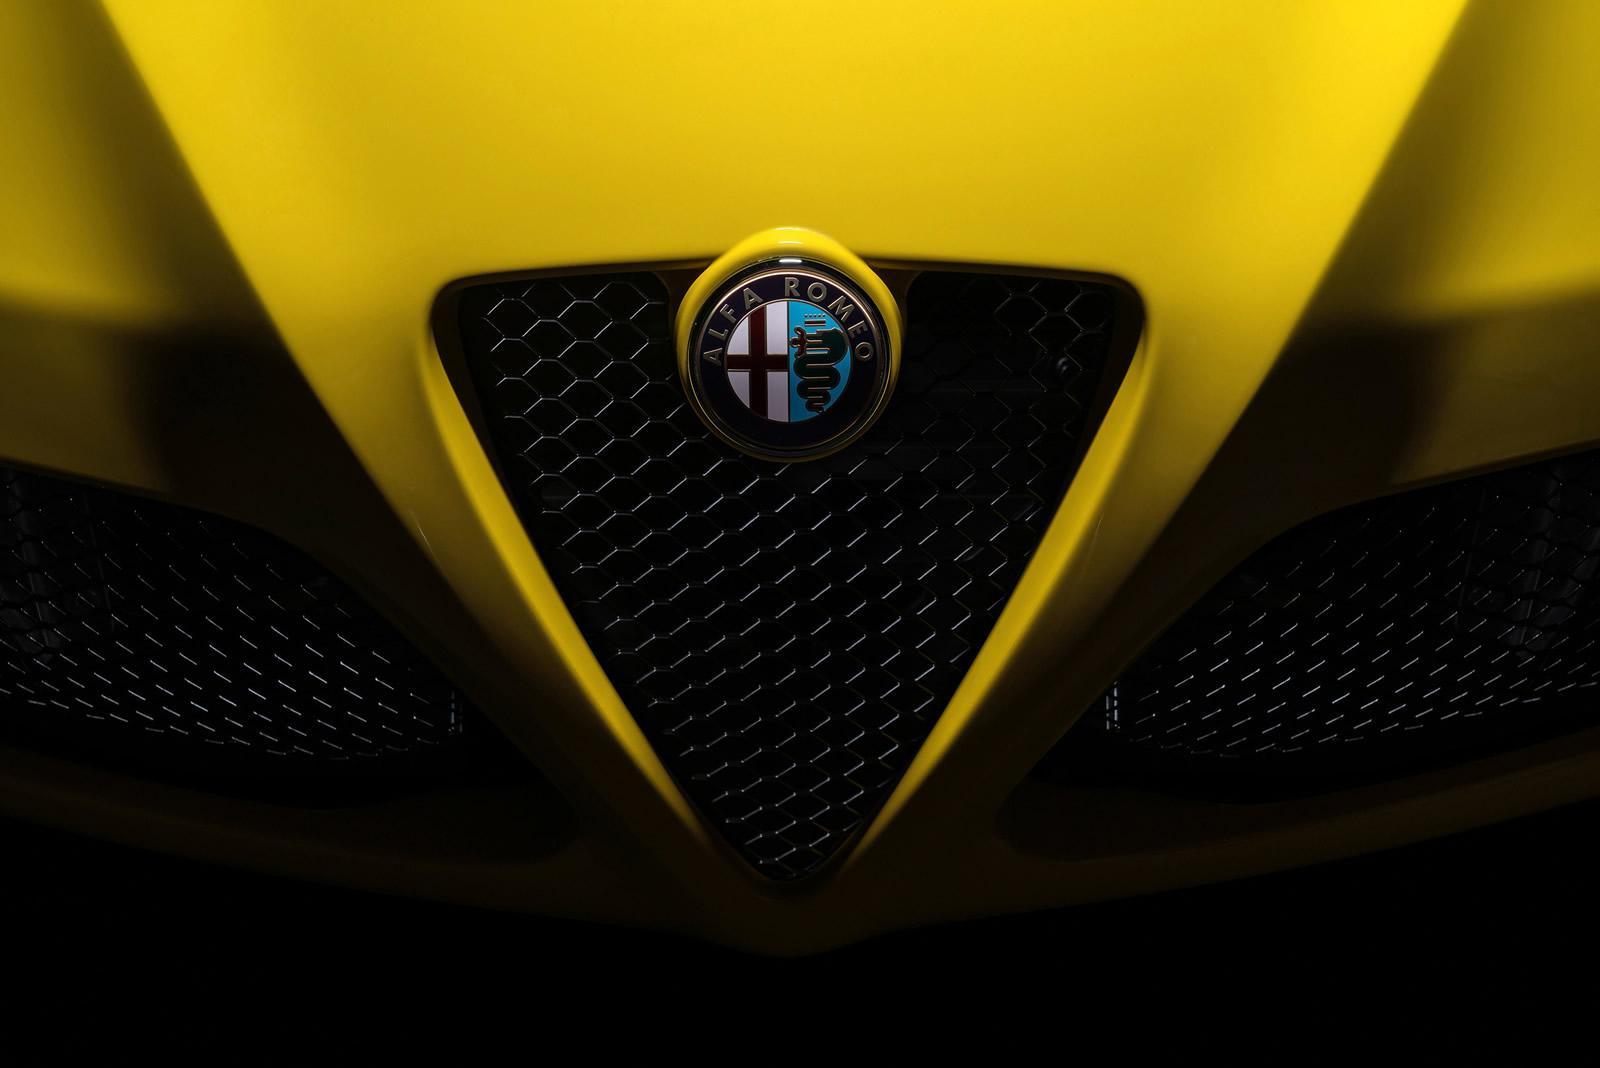 Alfa Romeo 4C Spider bows at 2015 Detroit Auto Show Image 302550